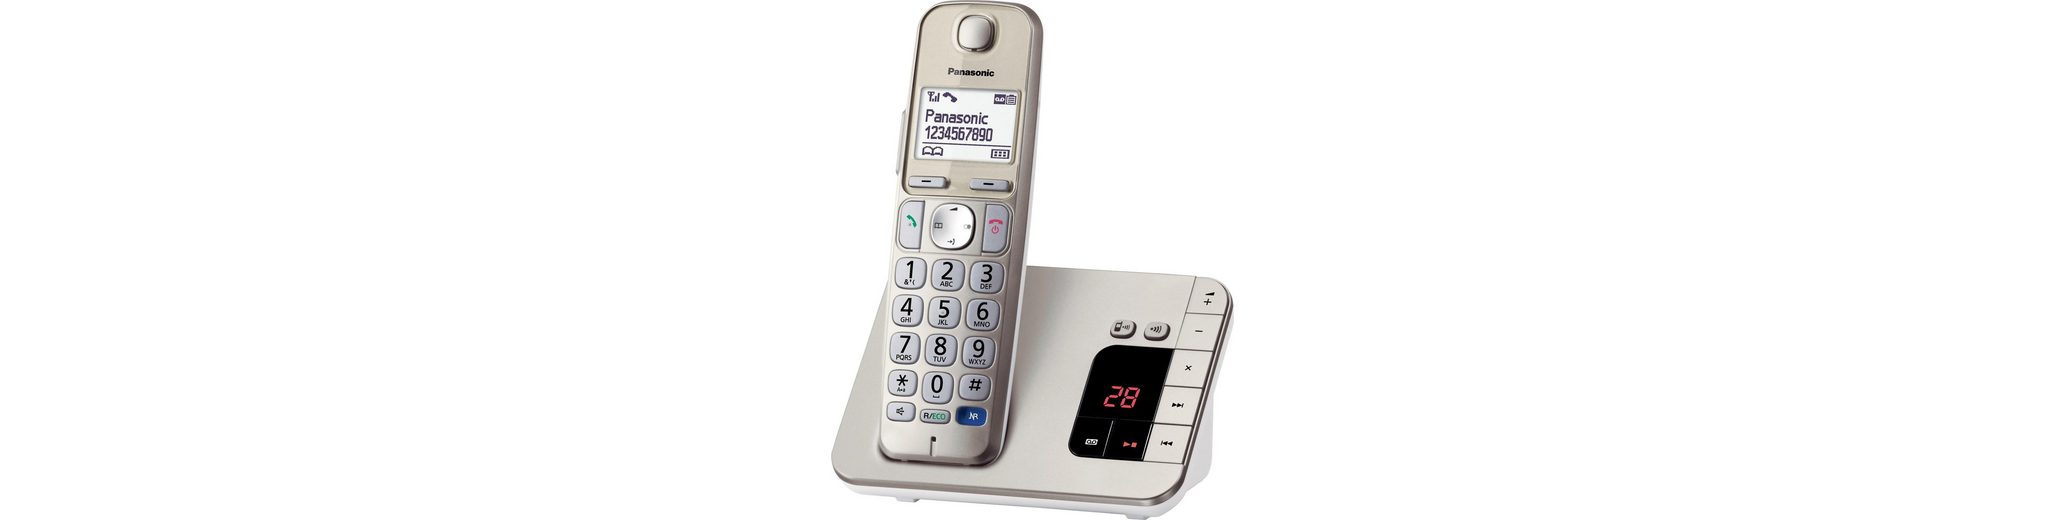 Panasonic KX-TGE220GN Schnurloses DECT Telefon mit AB